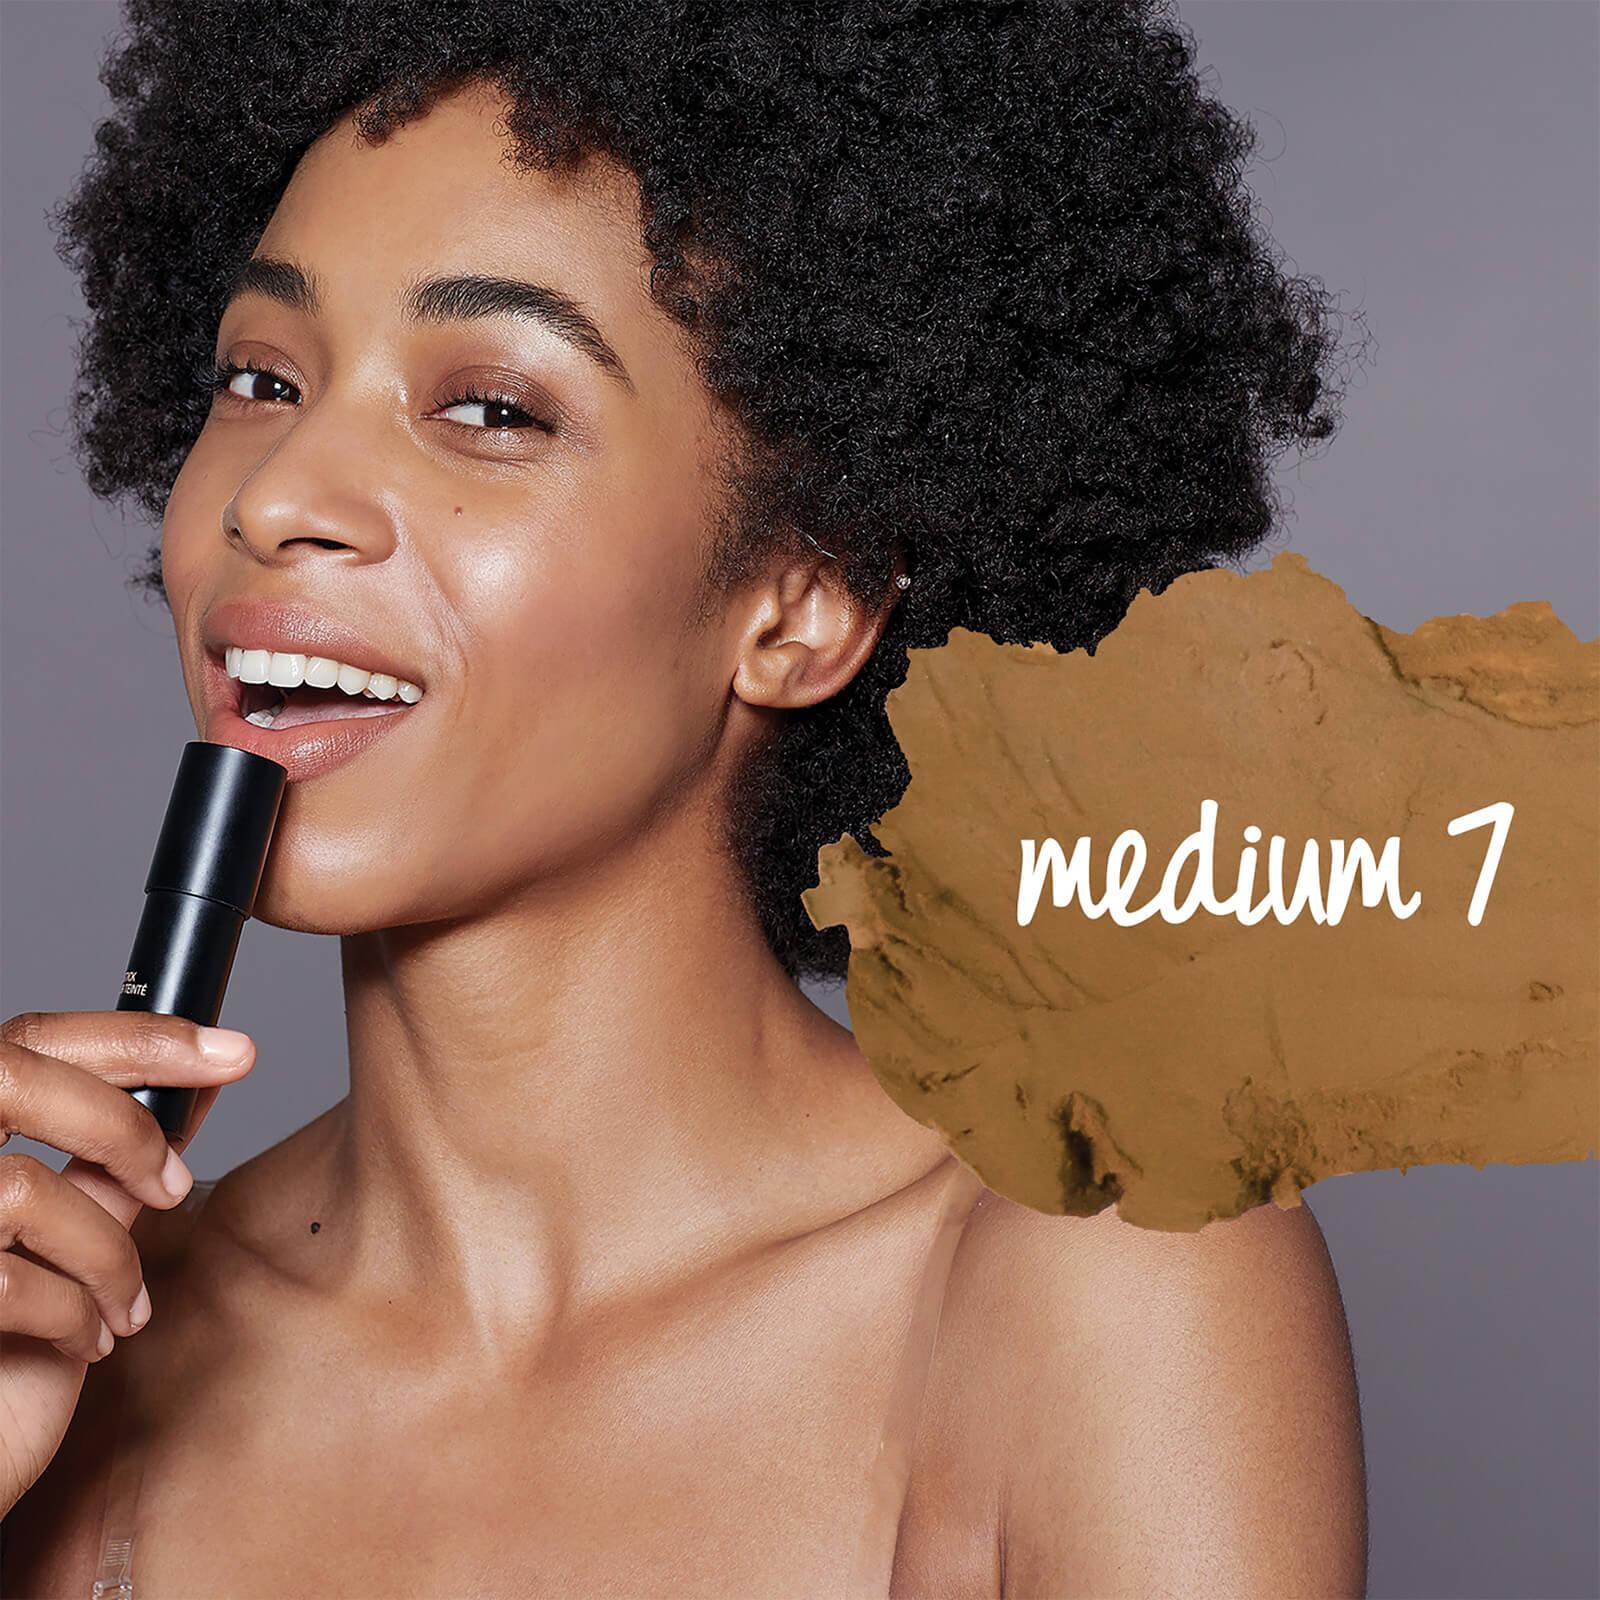 Nudestix Nudies Tinted Blur 6.12G (Various Shades) - Medium 7